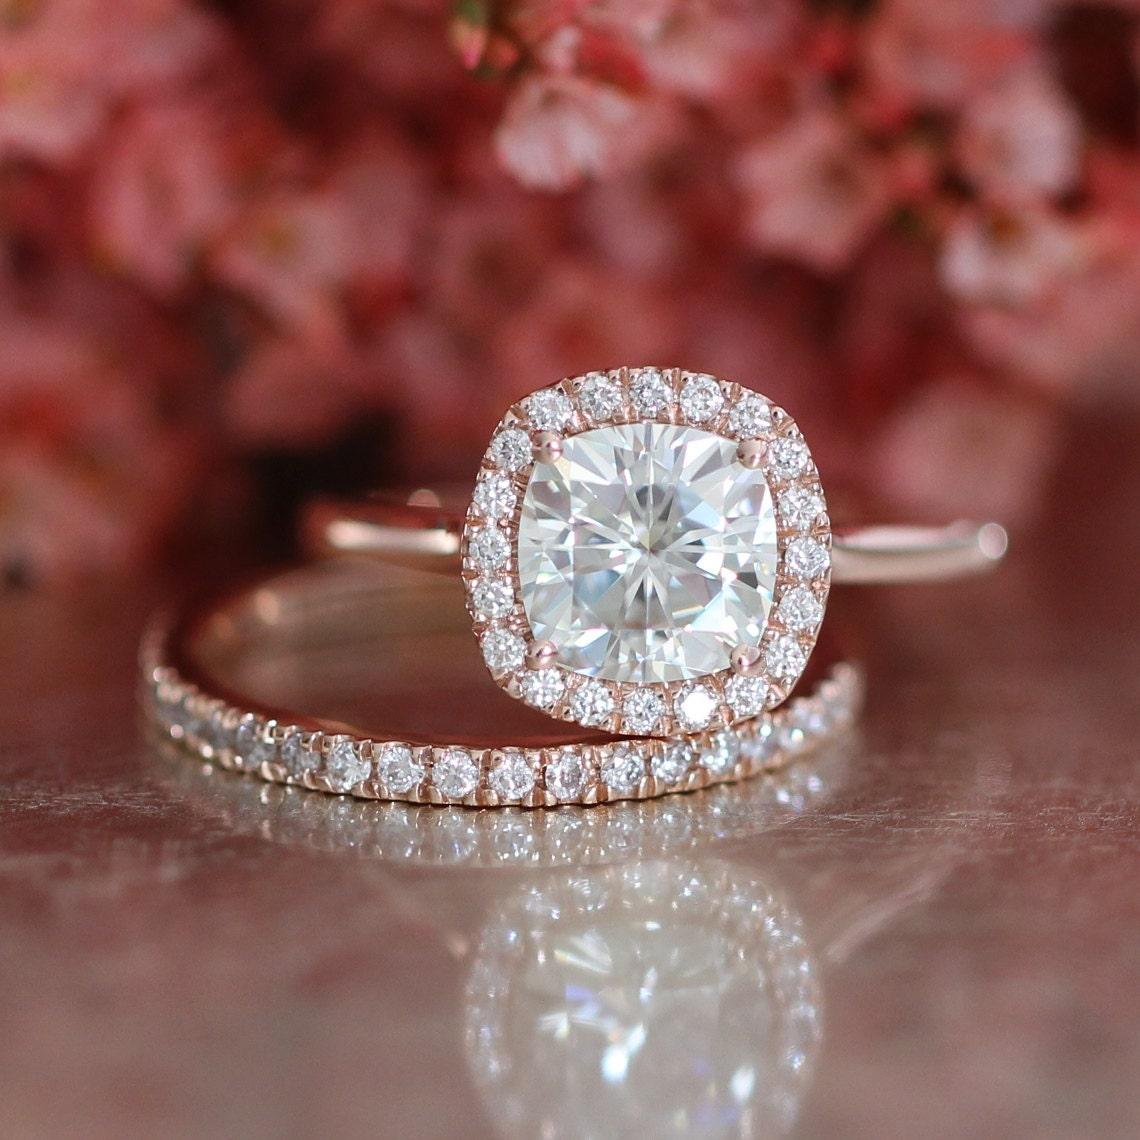 Cushion Moissanite Engagement Ring and Diamond Wedding Band